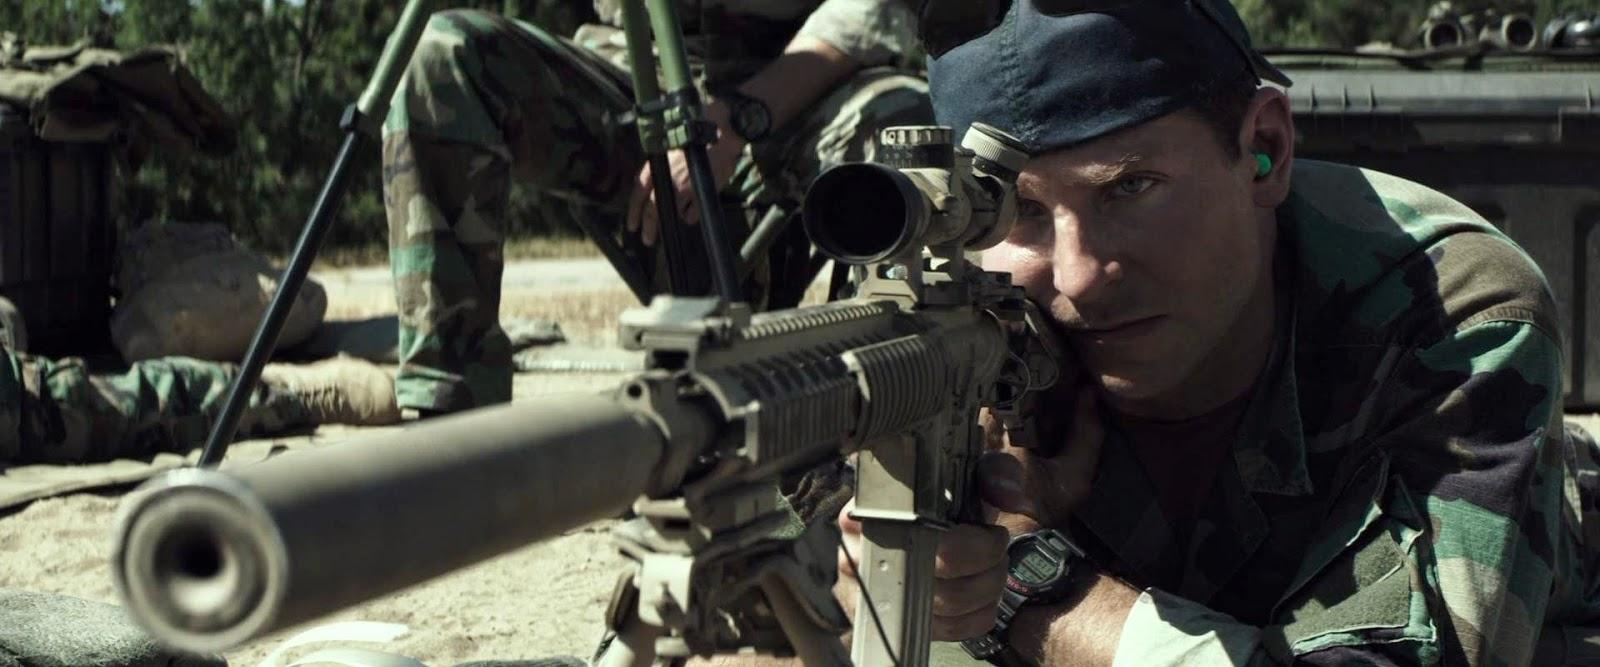 American Sniper (2014) S2 s American Sniper (2014)